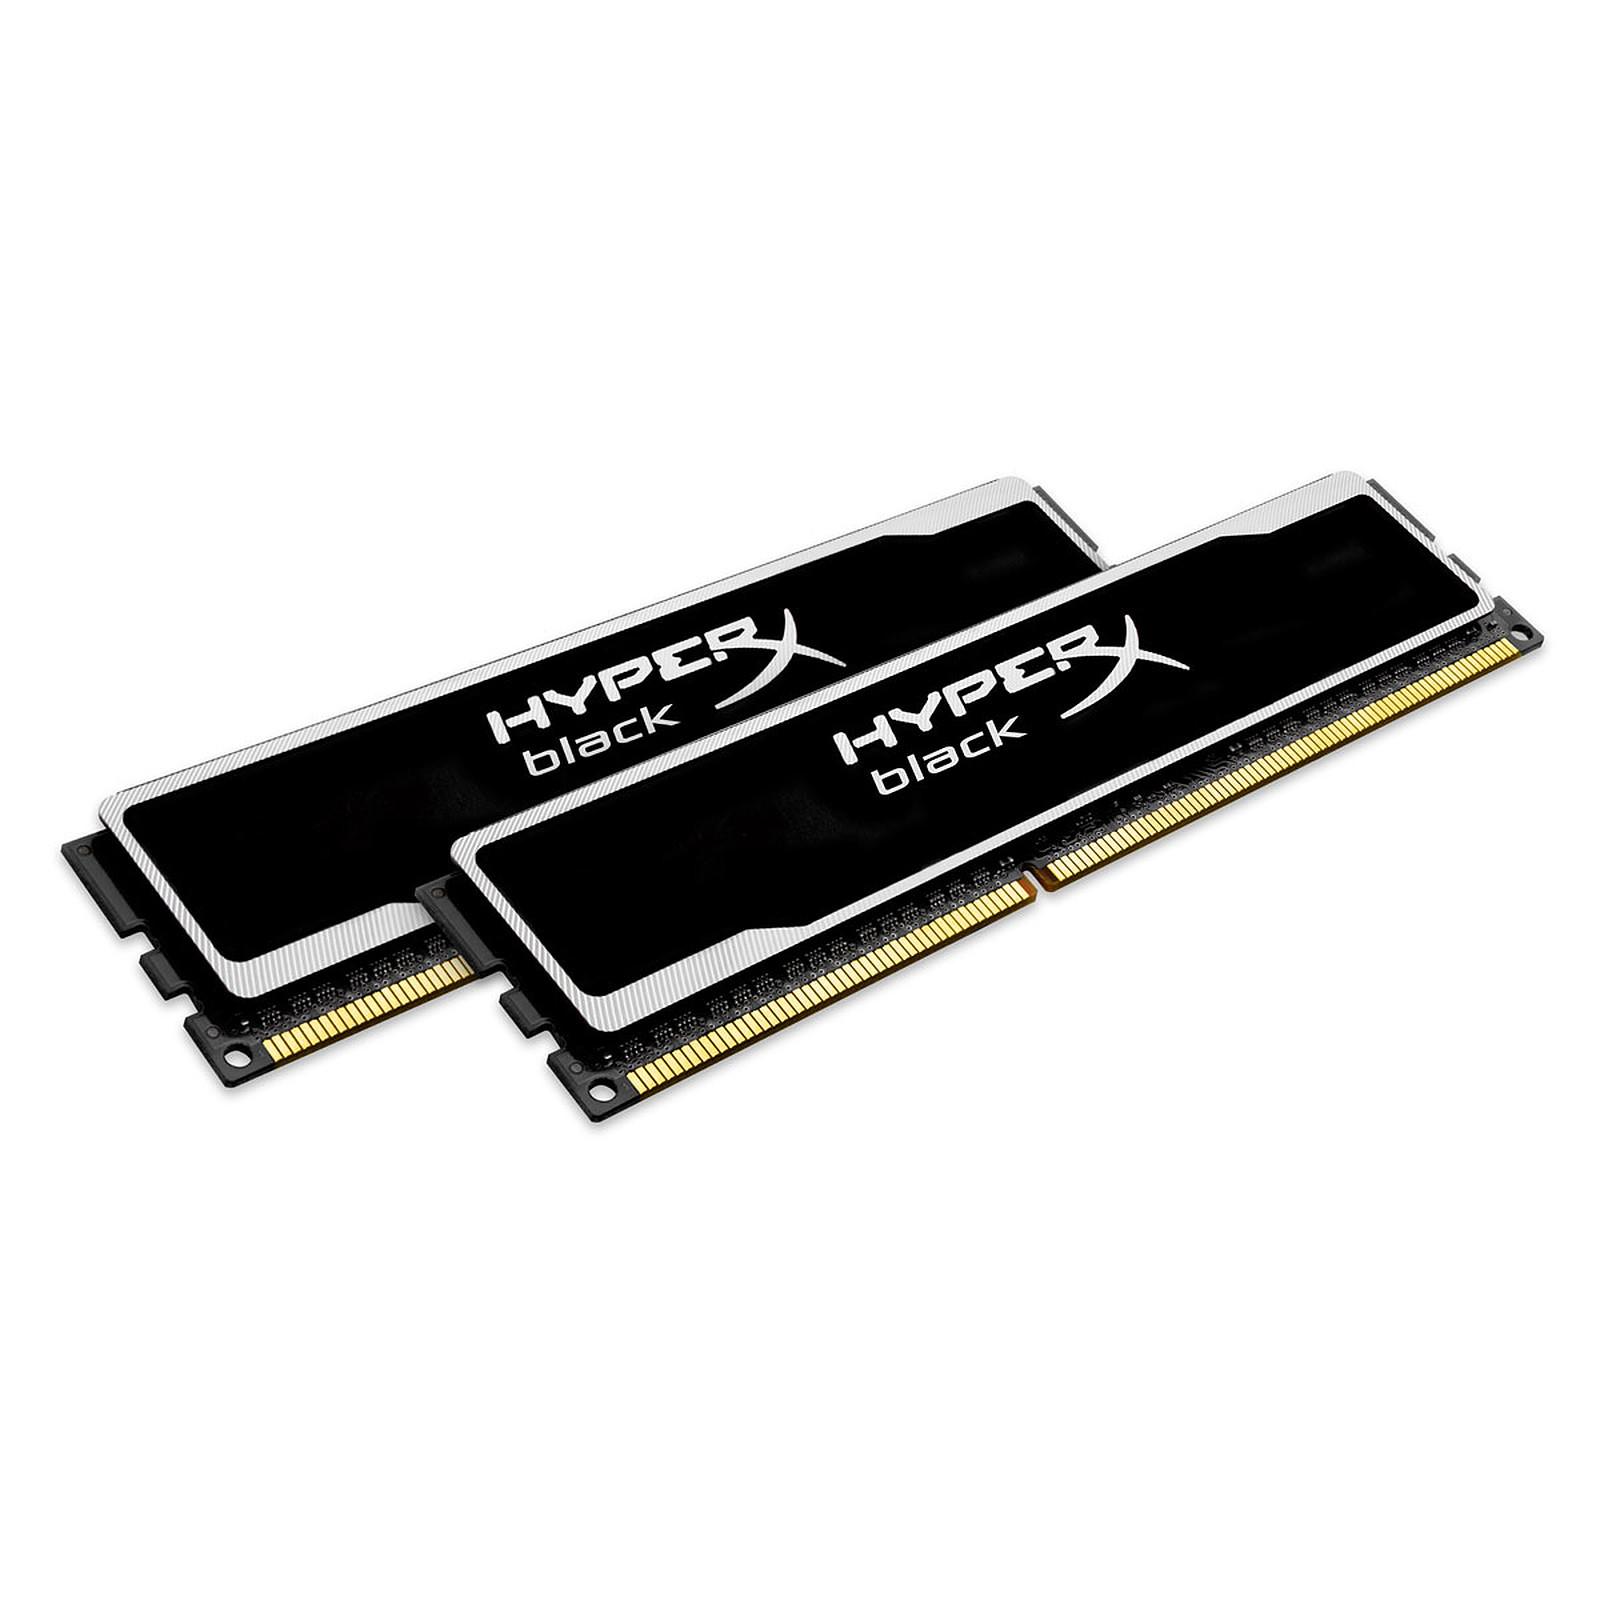 Kingston HyperX black 16 Go (2x 8 Go) DDR3 1600 MHz CL10